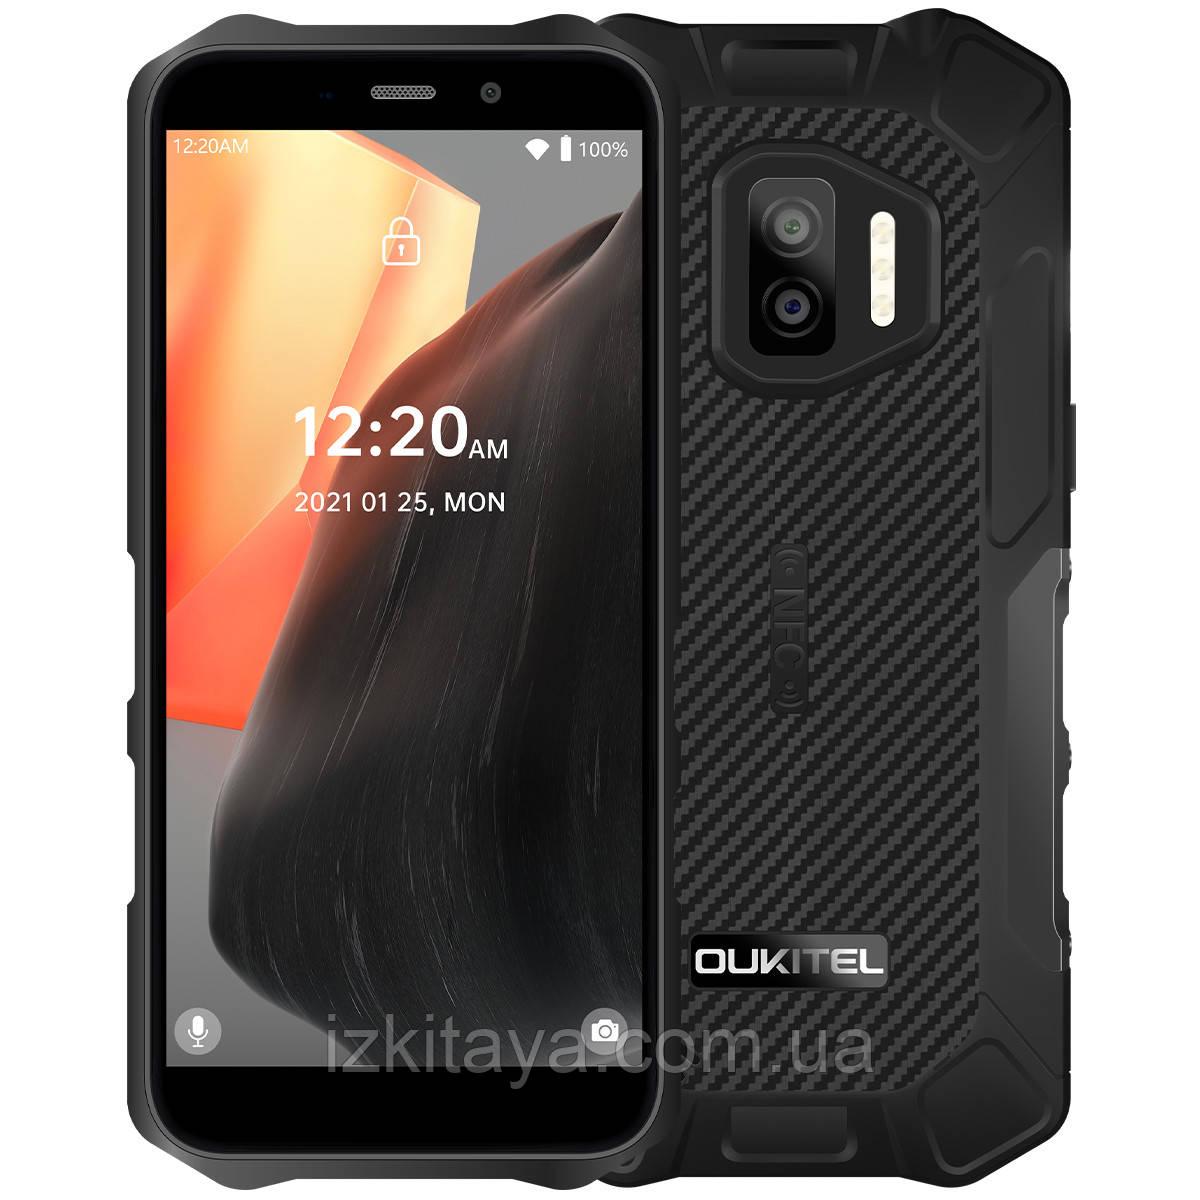 Смартфон OUKITEL WP12 black 4/32 Гб